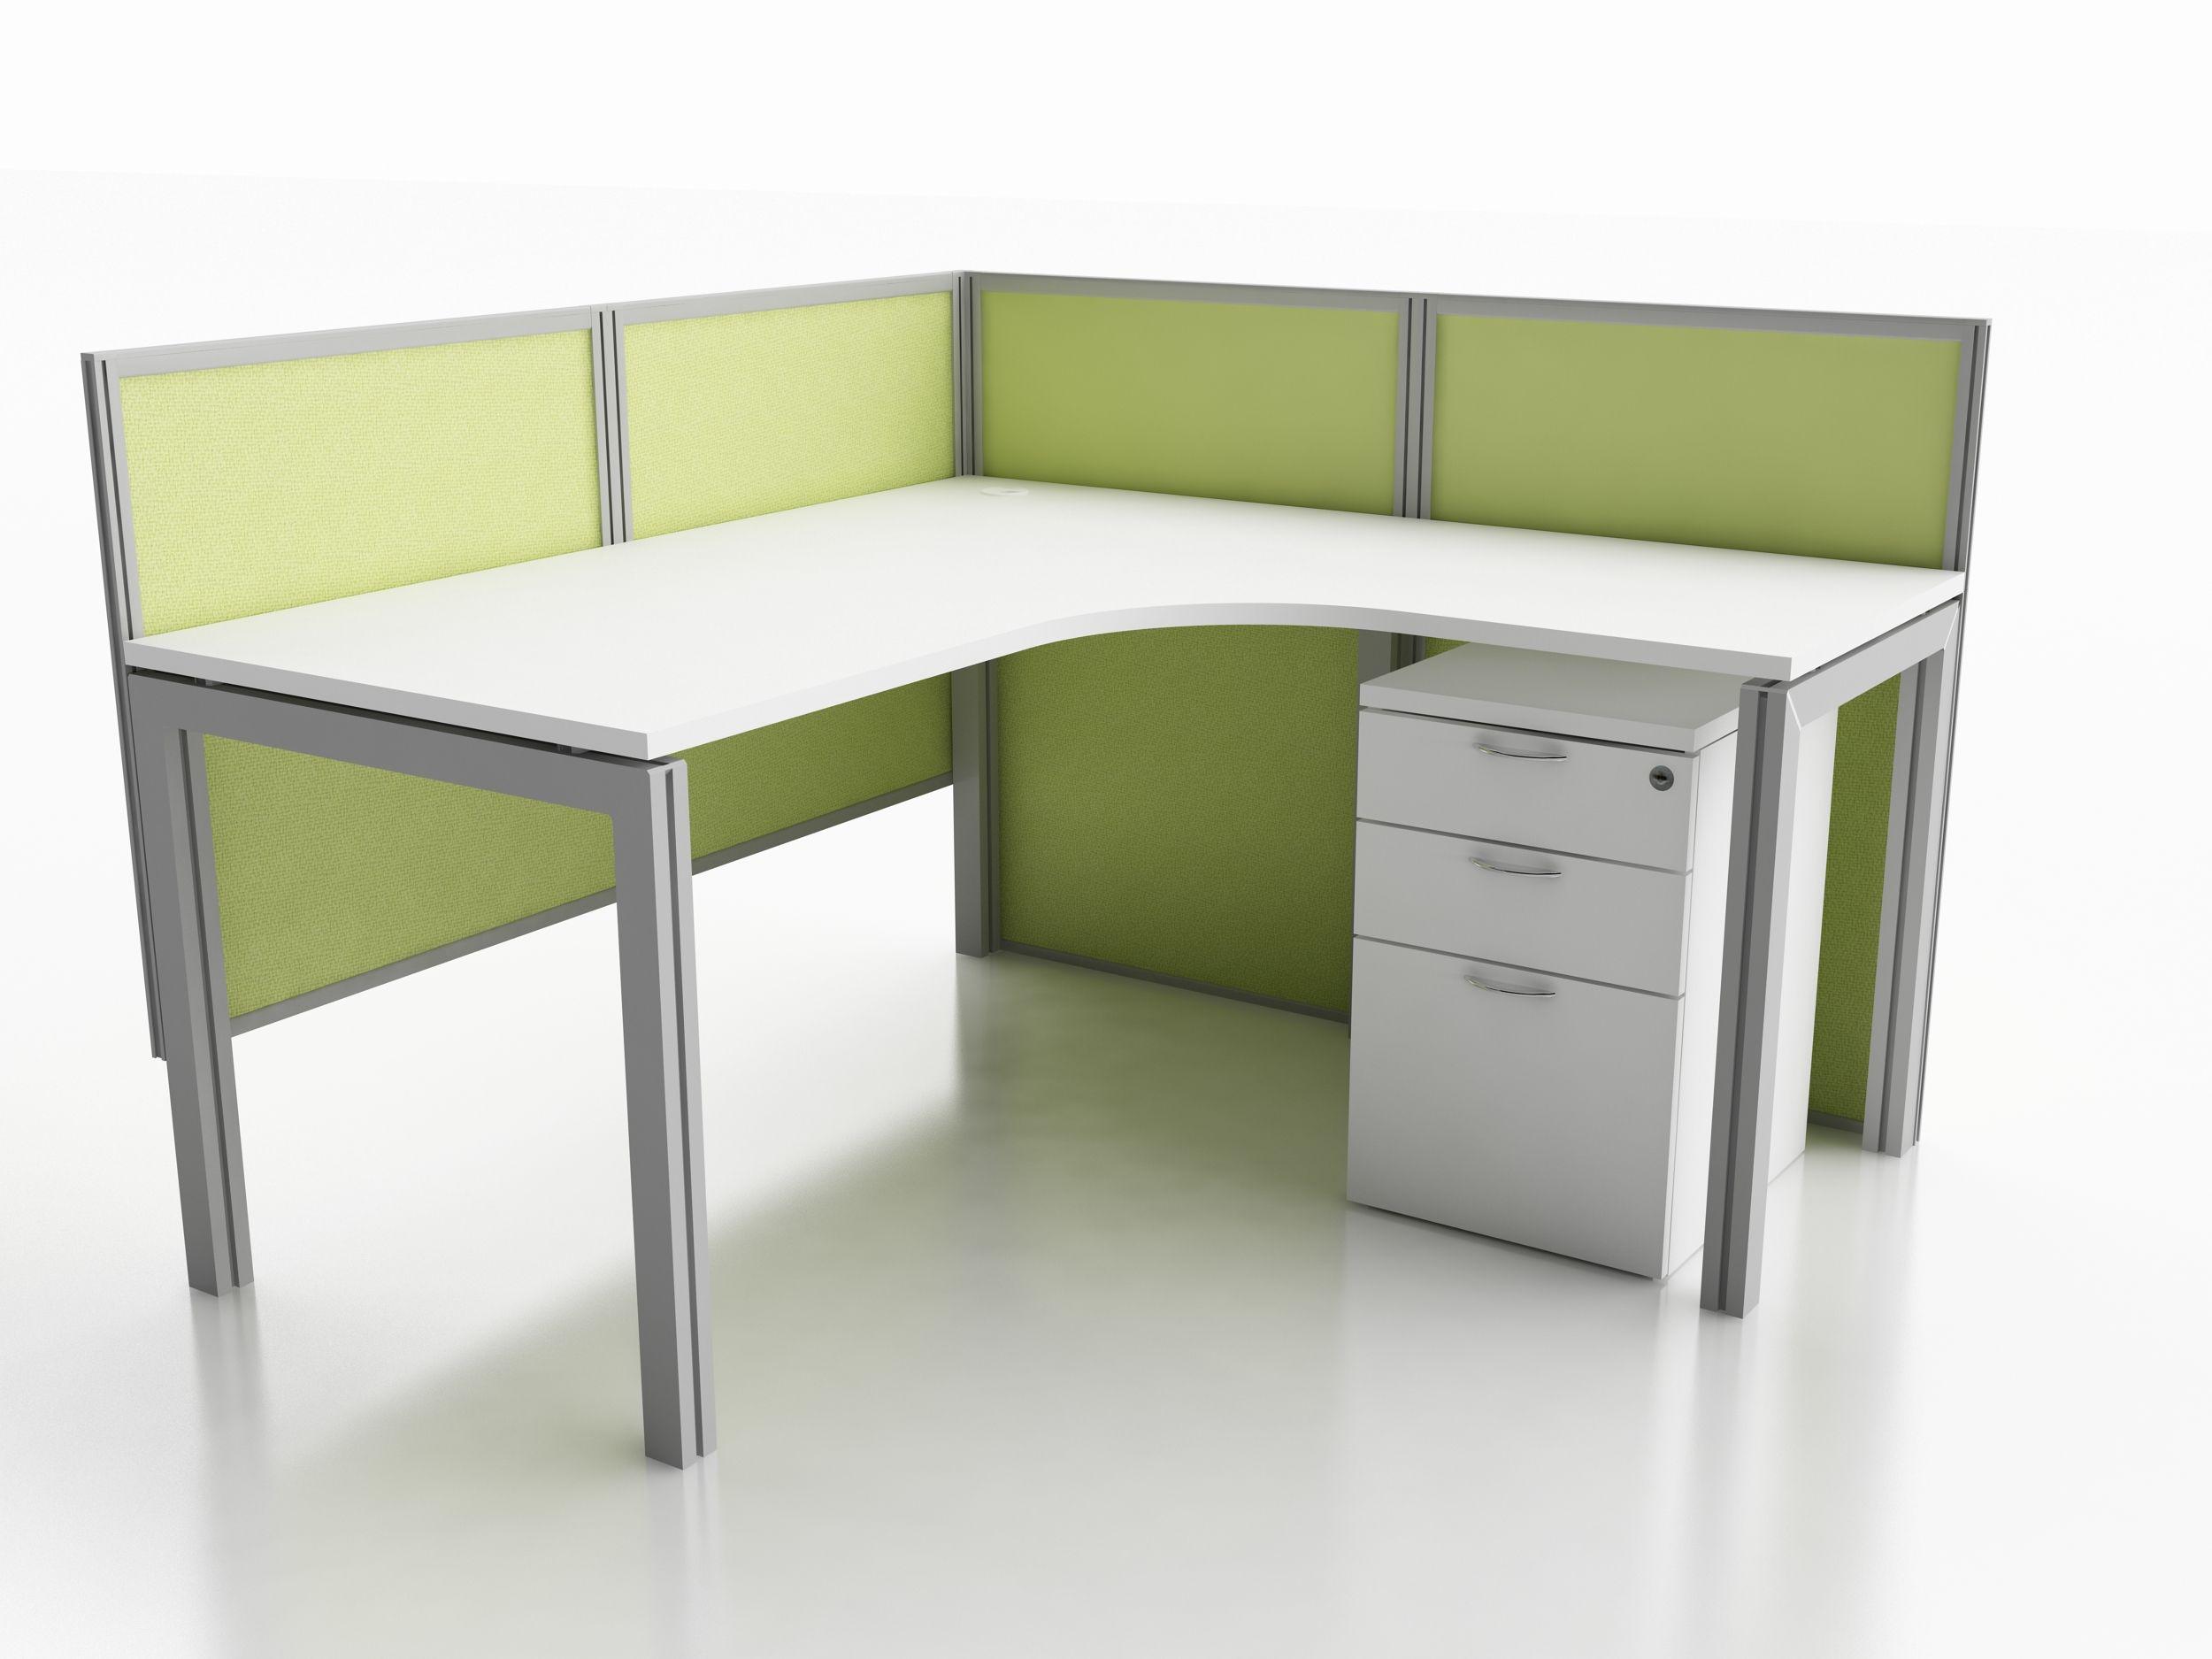 eco friendly office furniture. An Eco-friendly Workstation By Artmatrix Trend X-Desking System Http:// Eco Friendly Office Furniture